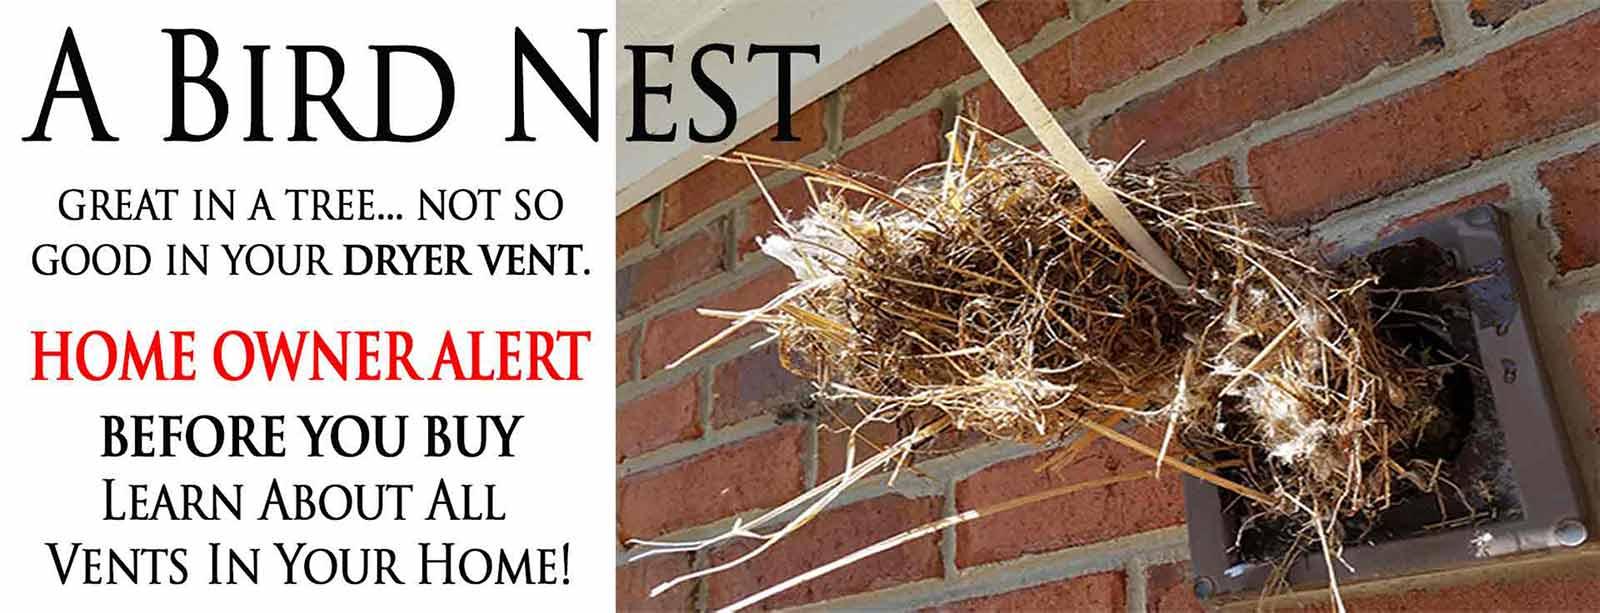 Bird S Nest Removal Bird Covers Vent Screens